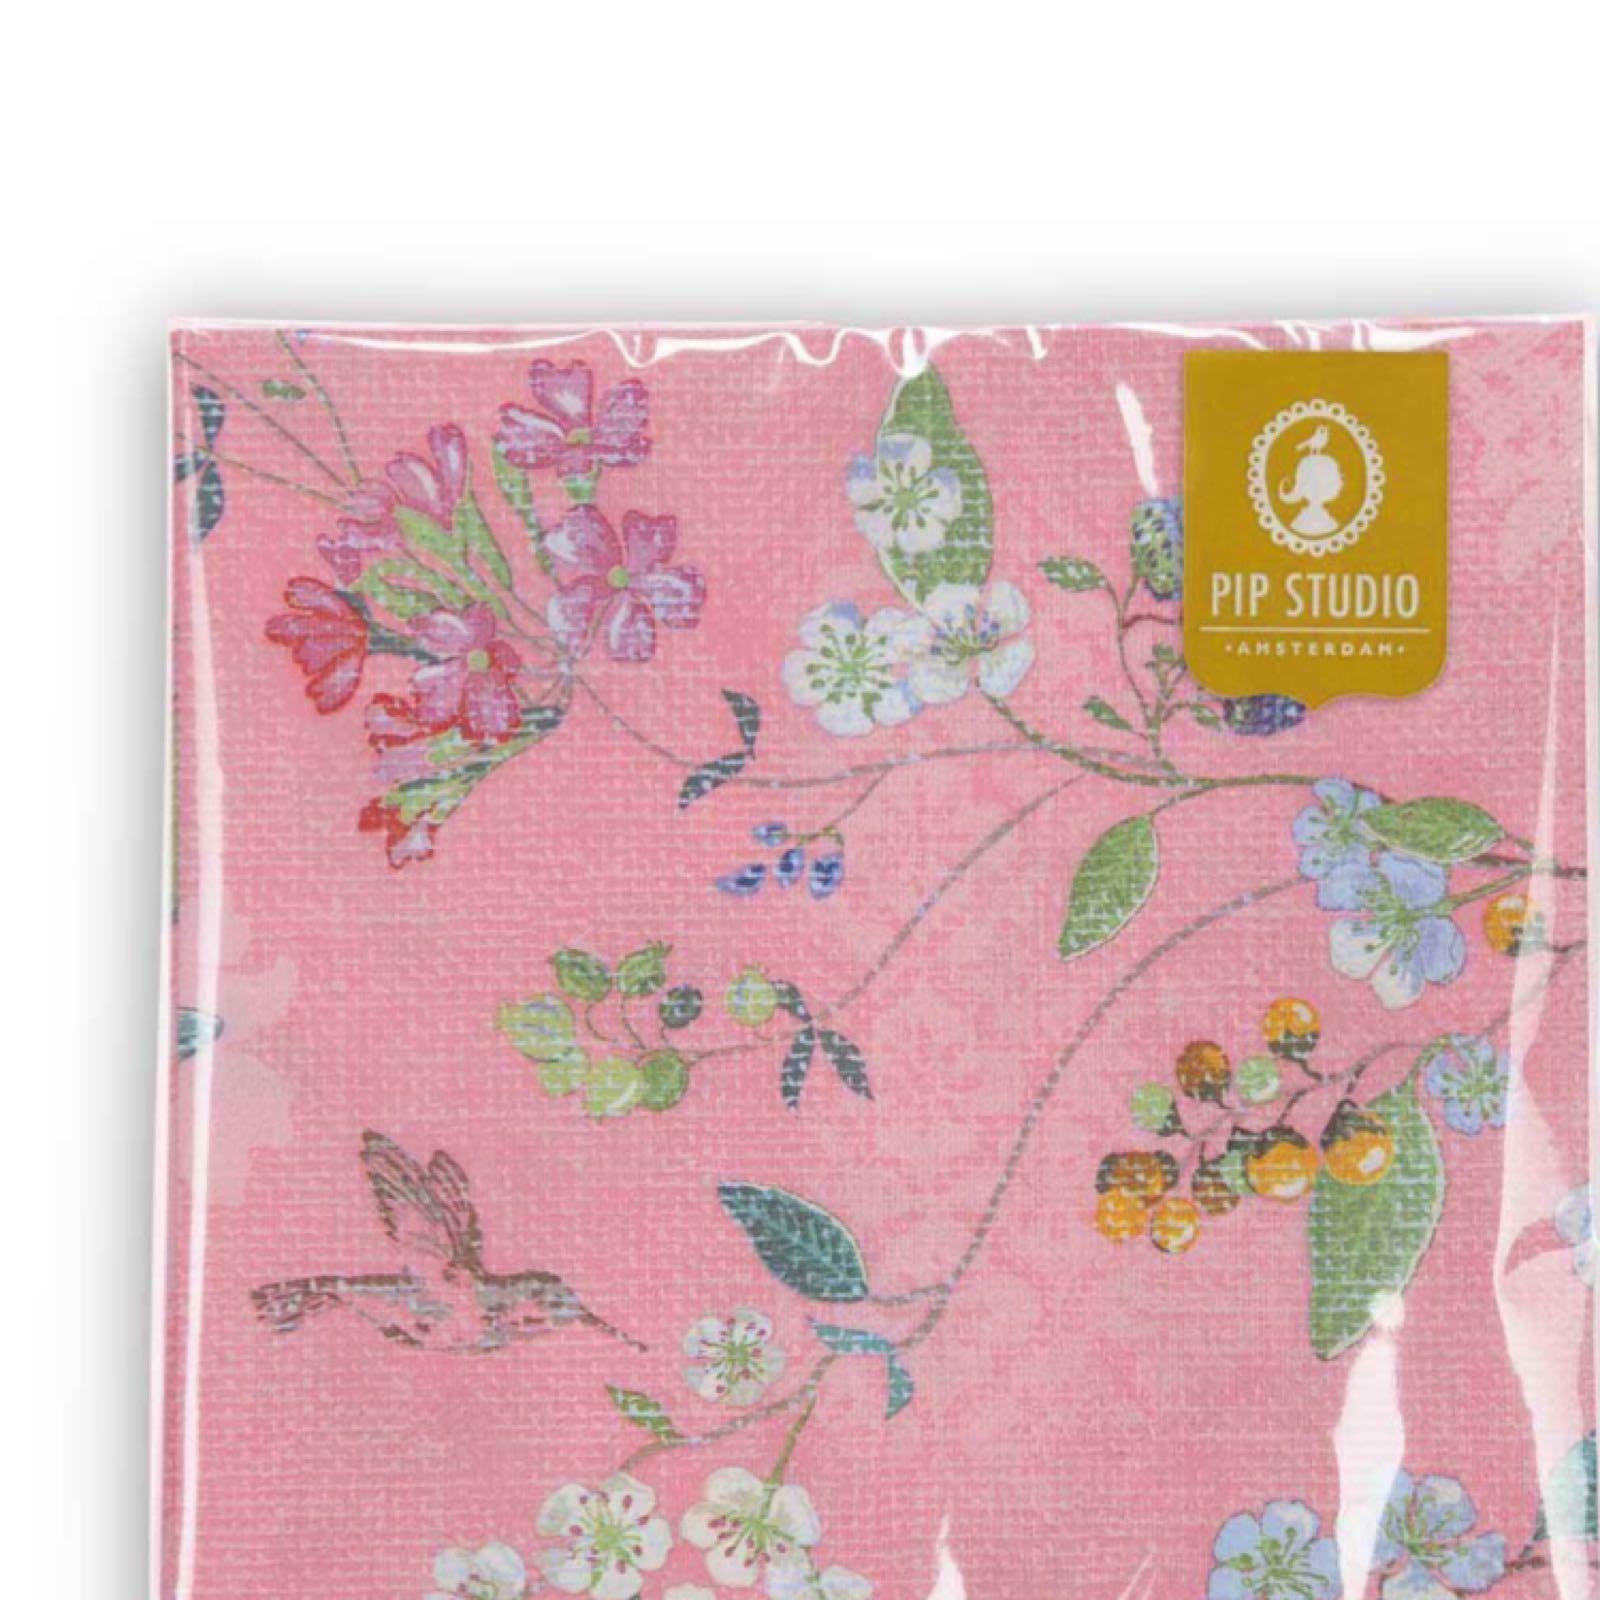 Pip studio hummingbird pink paper napkins pack of 20 was £4.50